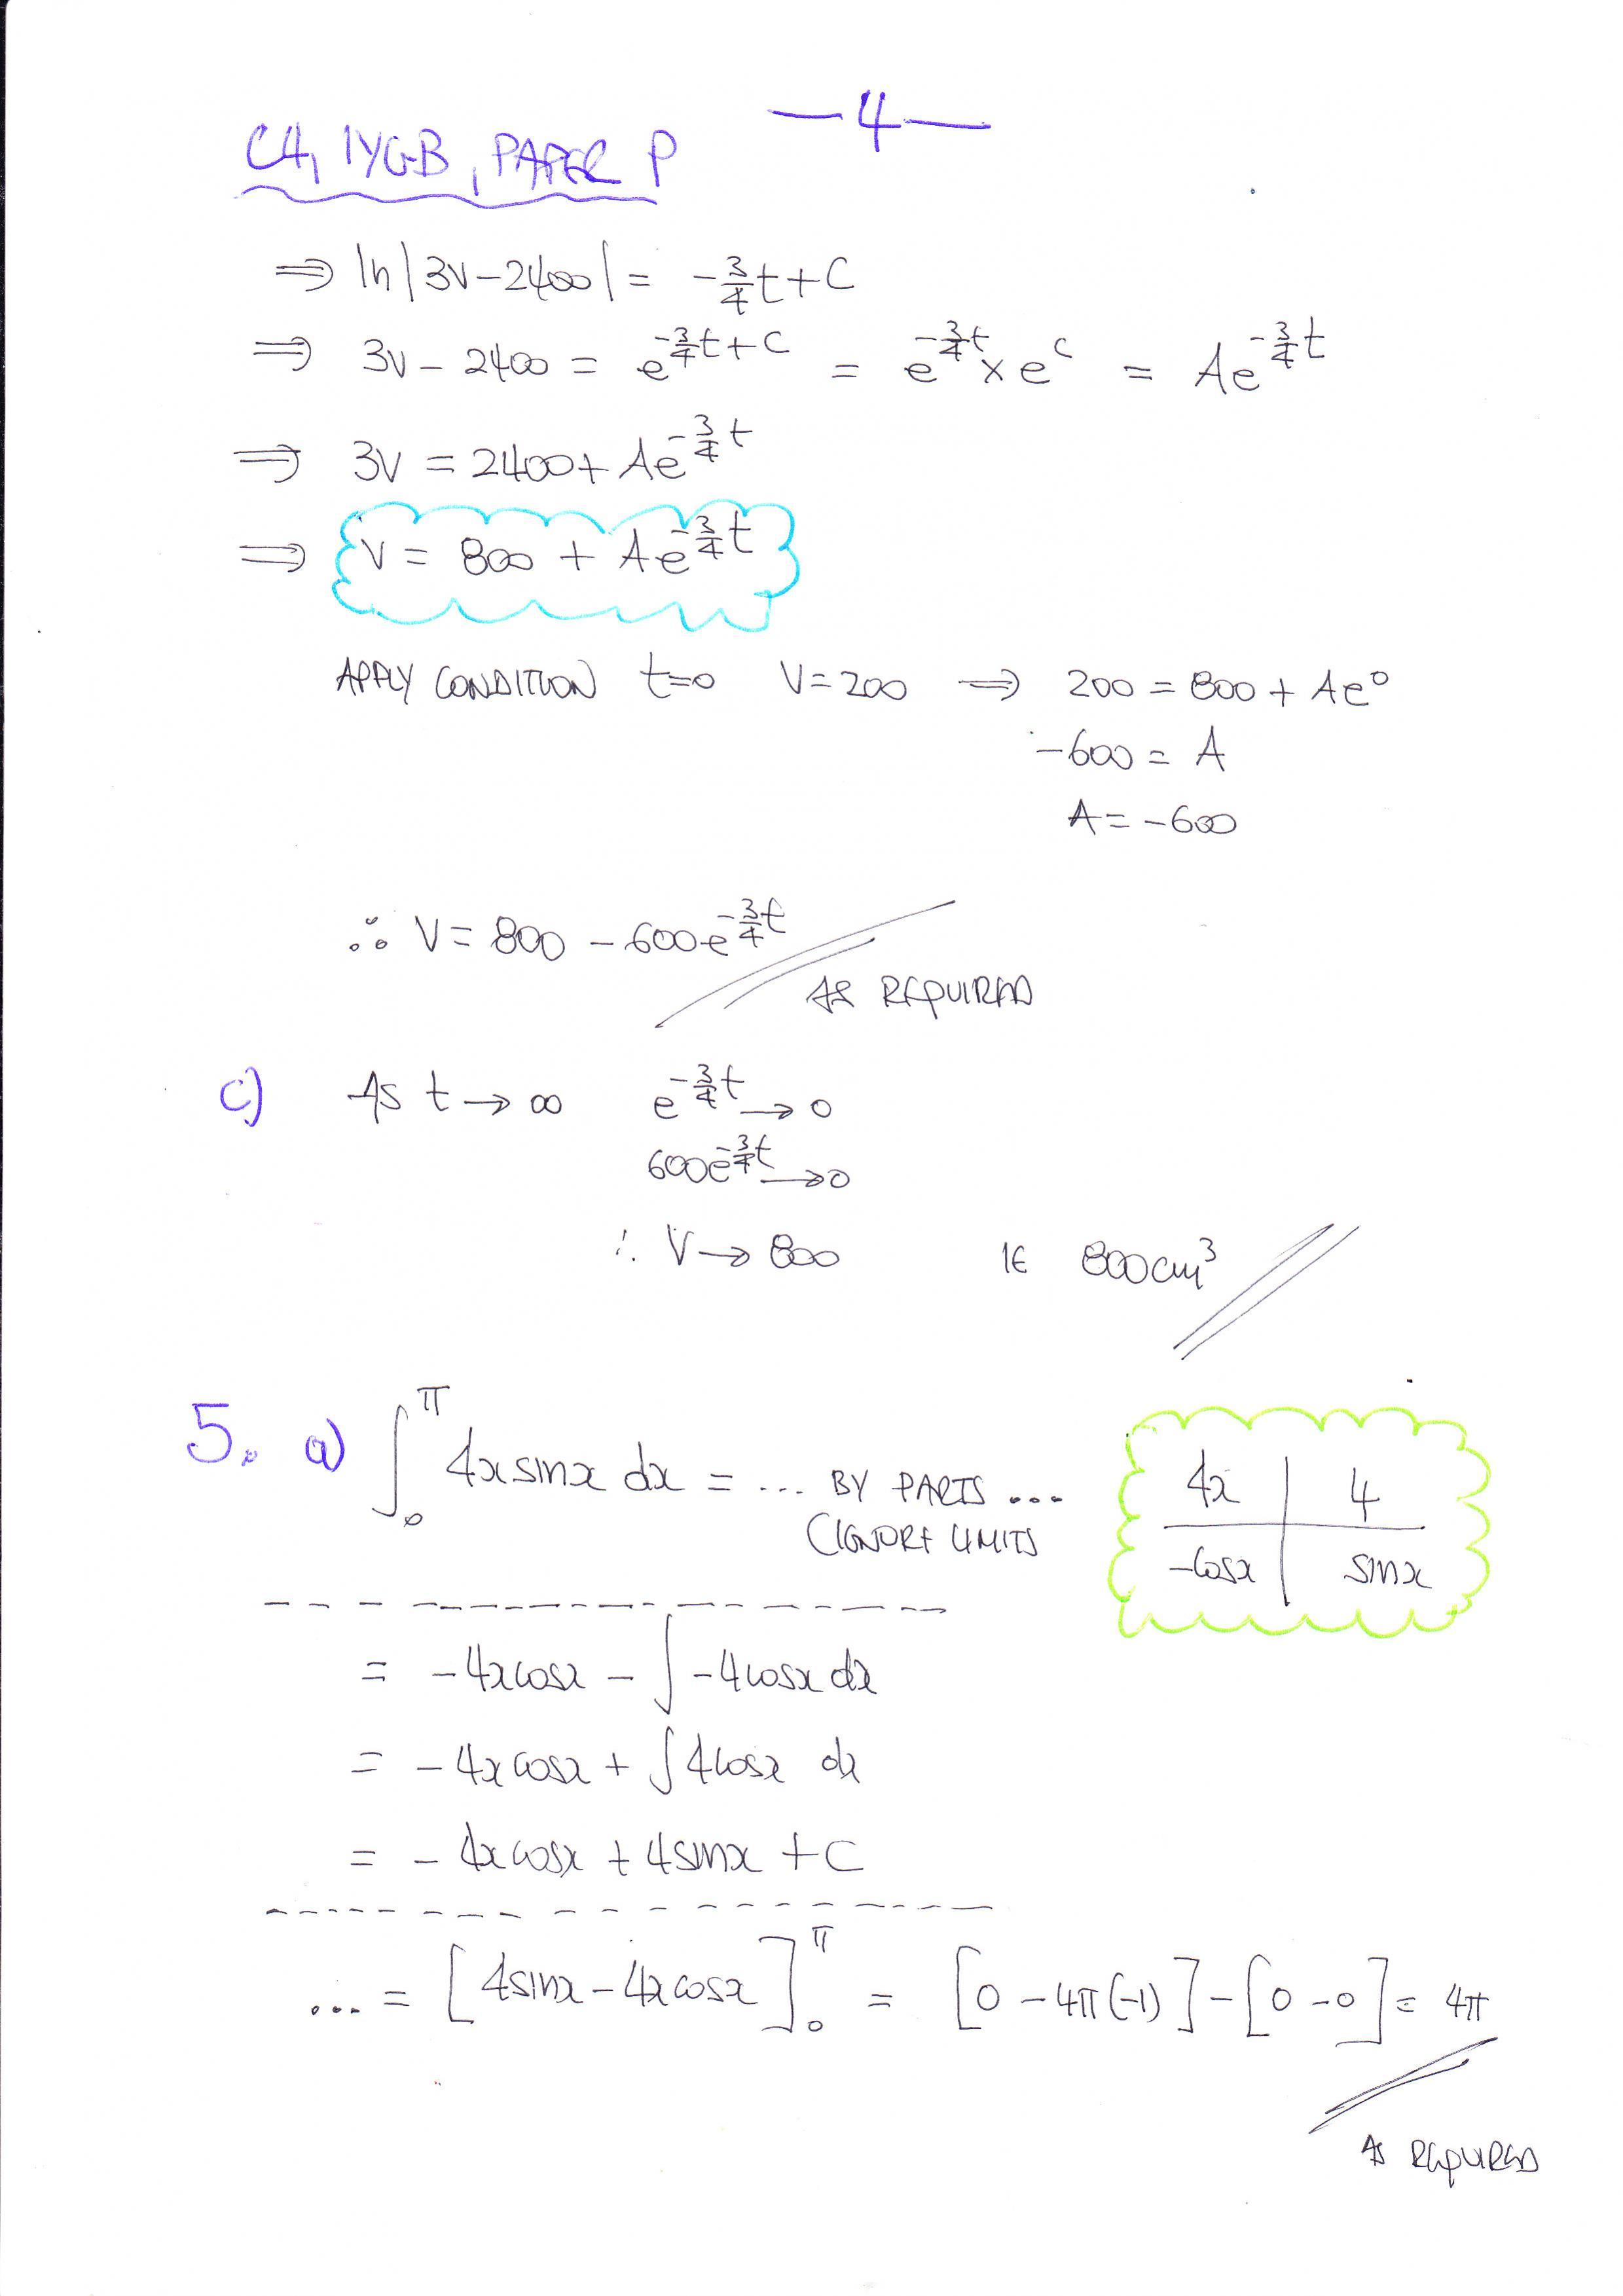 Name:  C4, IYGB, Paper P, page 4.jpg Views: 84 Size:  323.8 KB